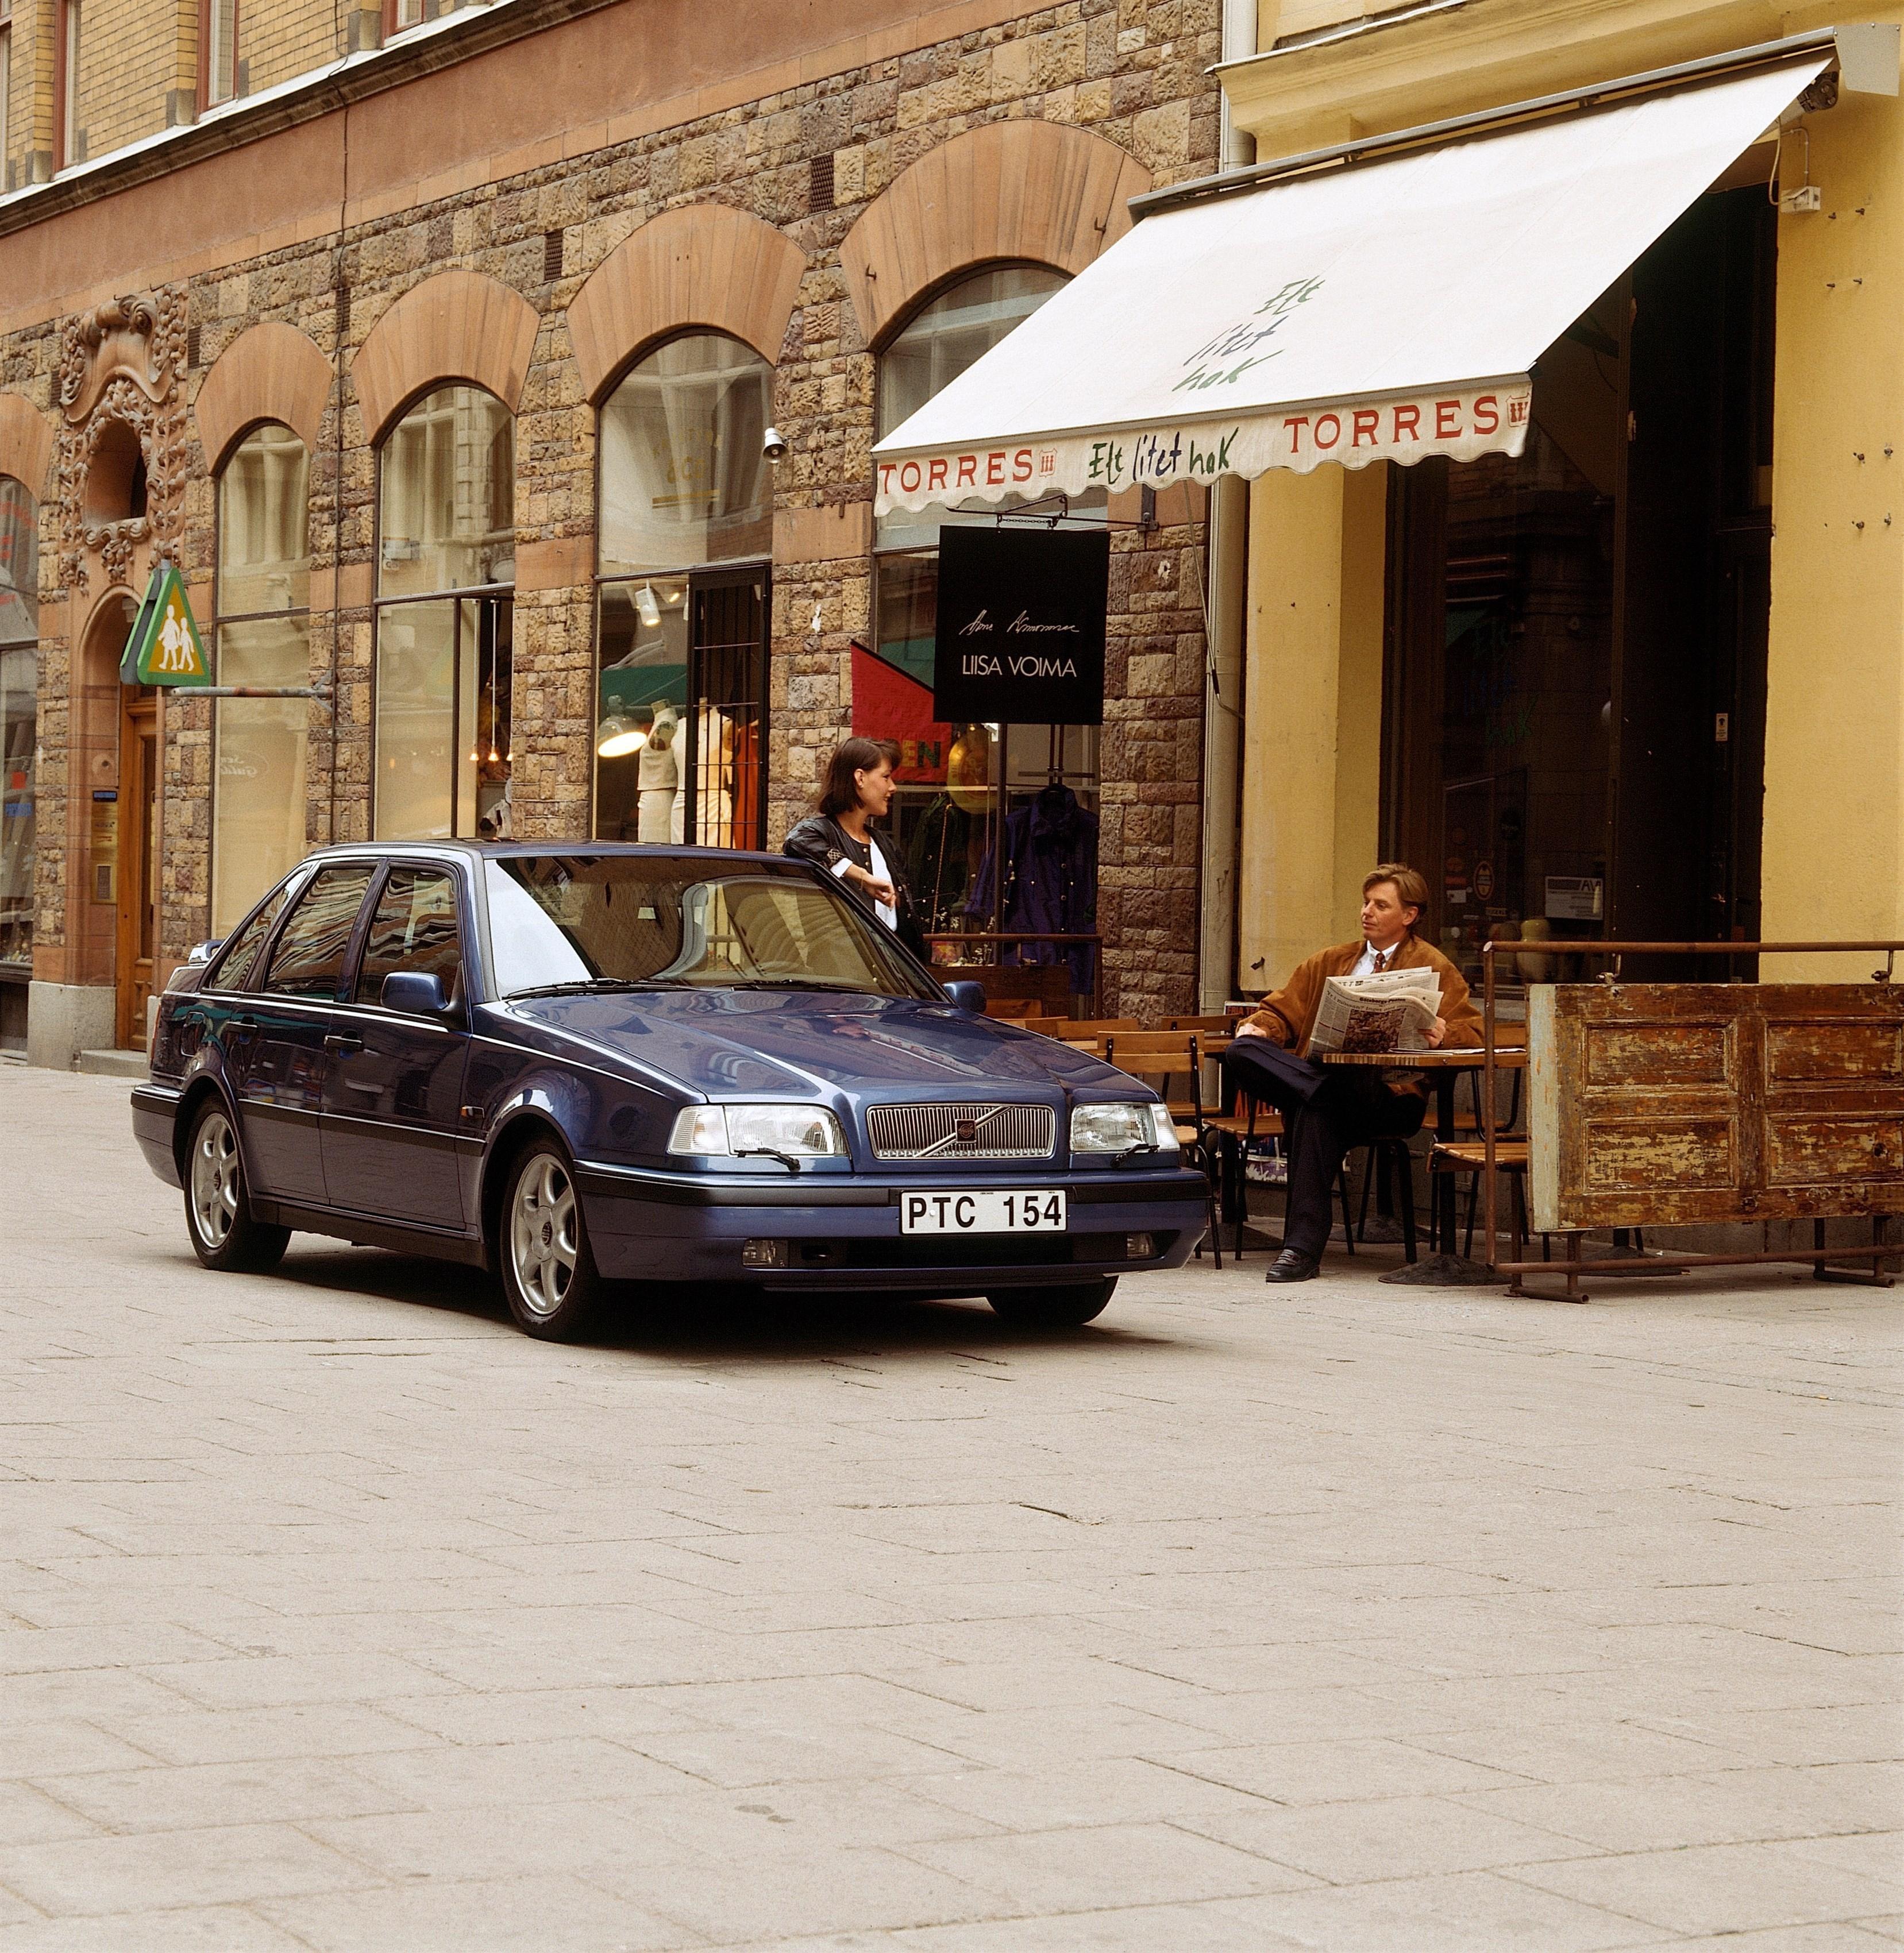 Volvo 440 celebrates its 30th anniversary